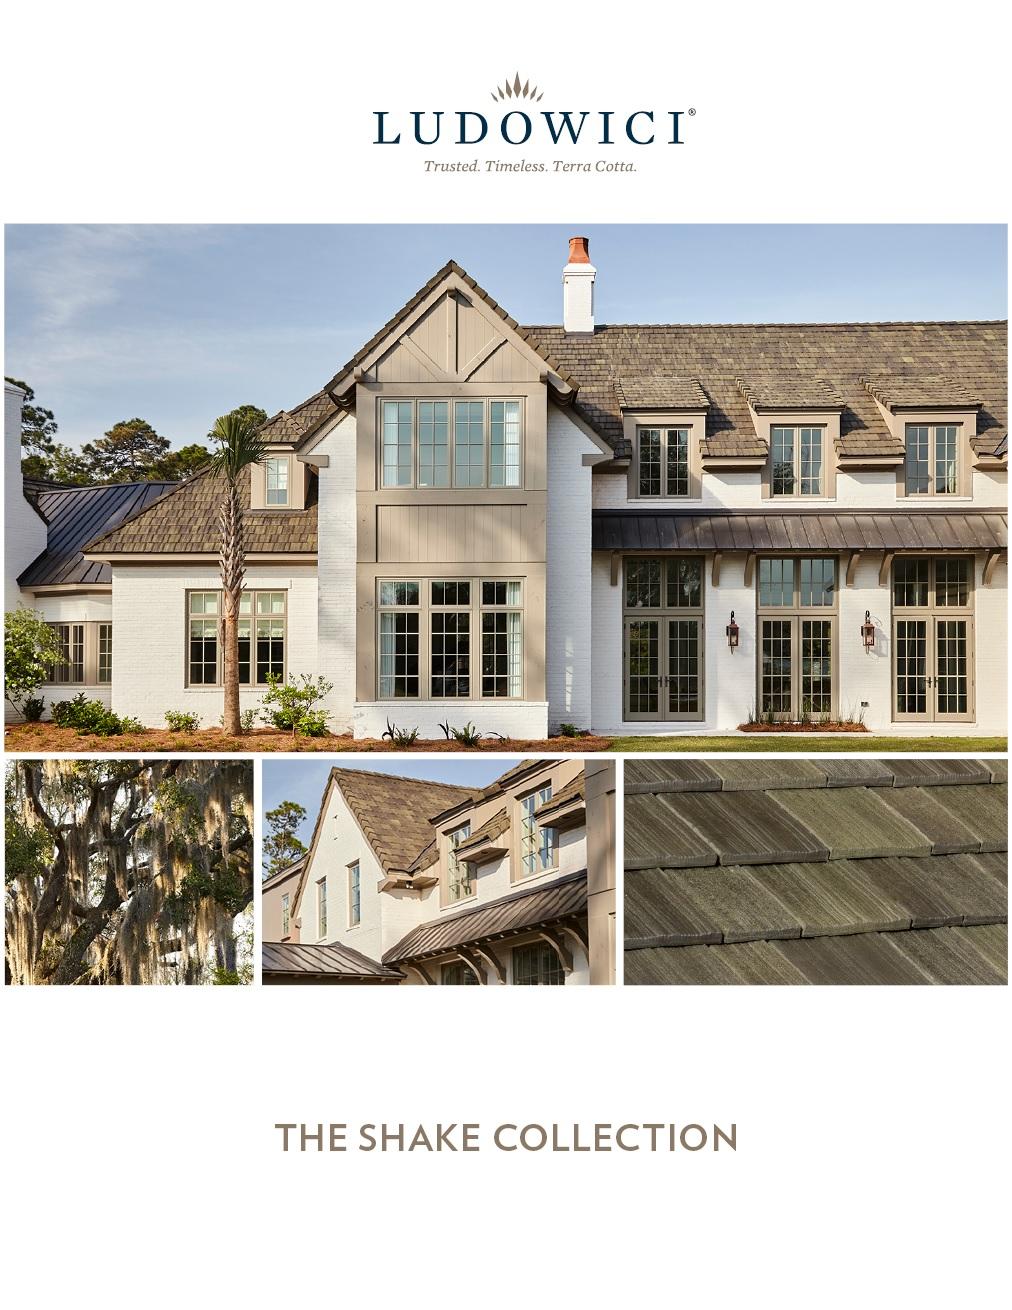 Ludowici Shake Collection